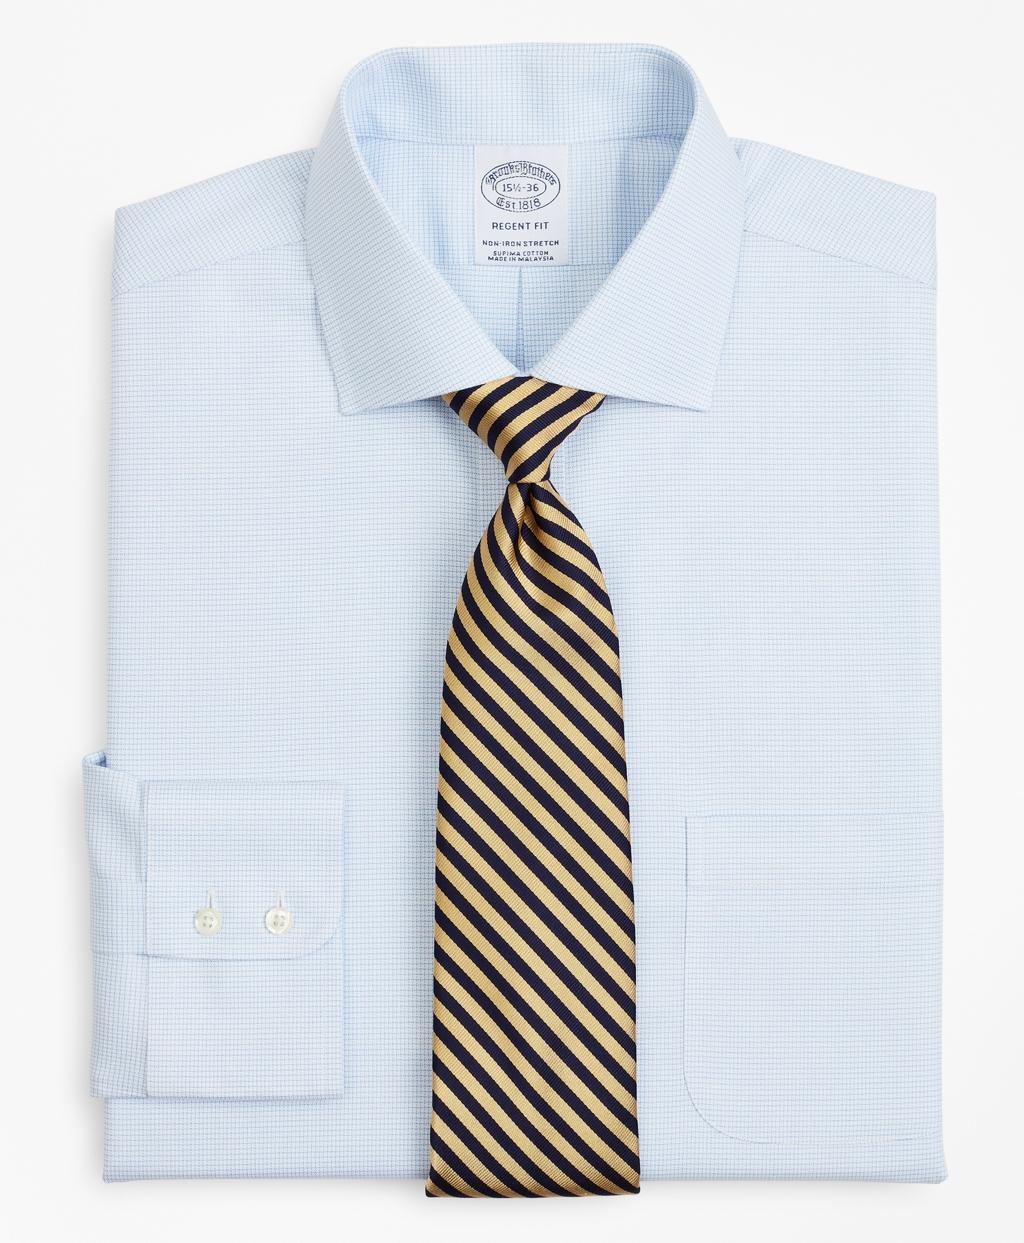 Brooksbrothers Stretch Regent Regular-Fit Dress Shirt, Non-Iron Twill English Collar Micro-Check